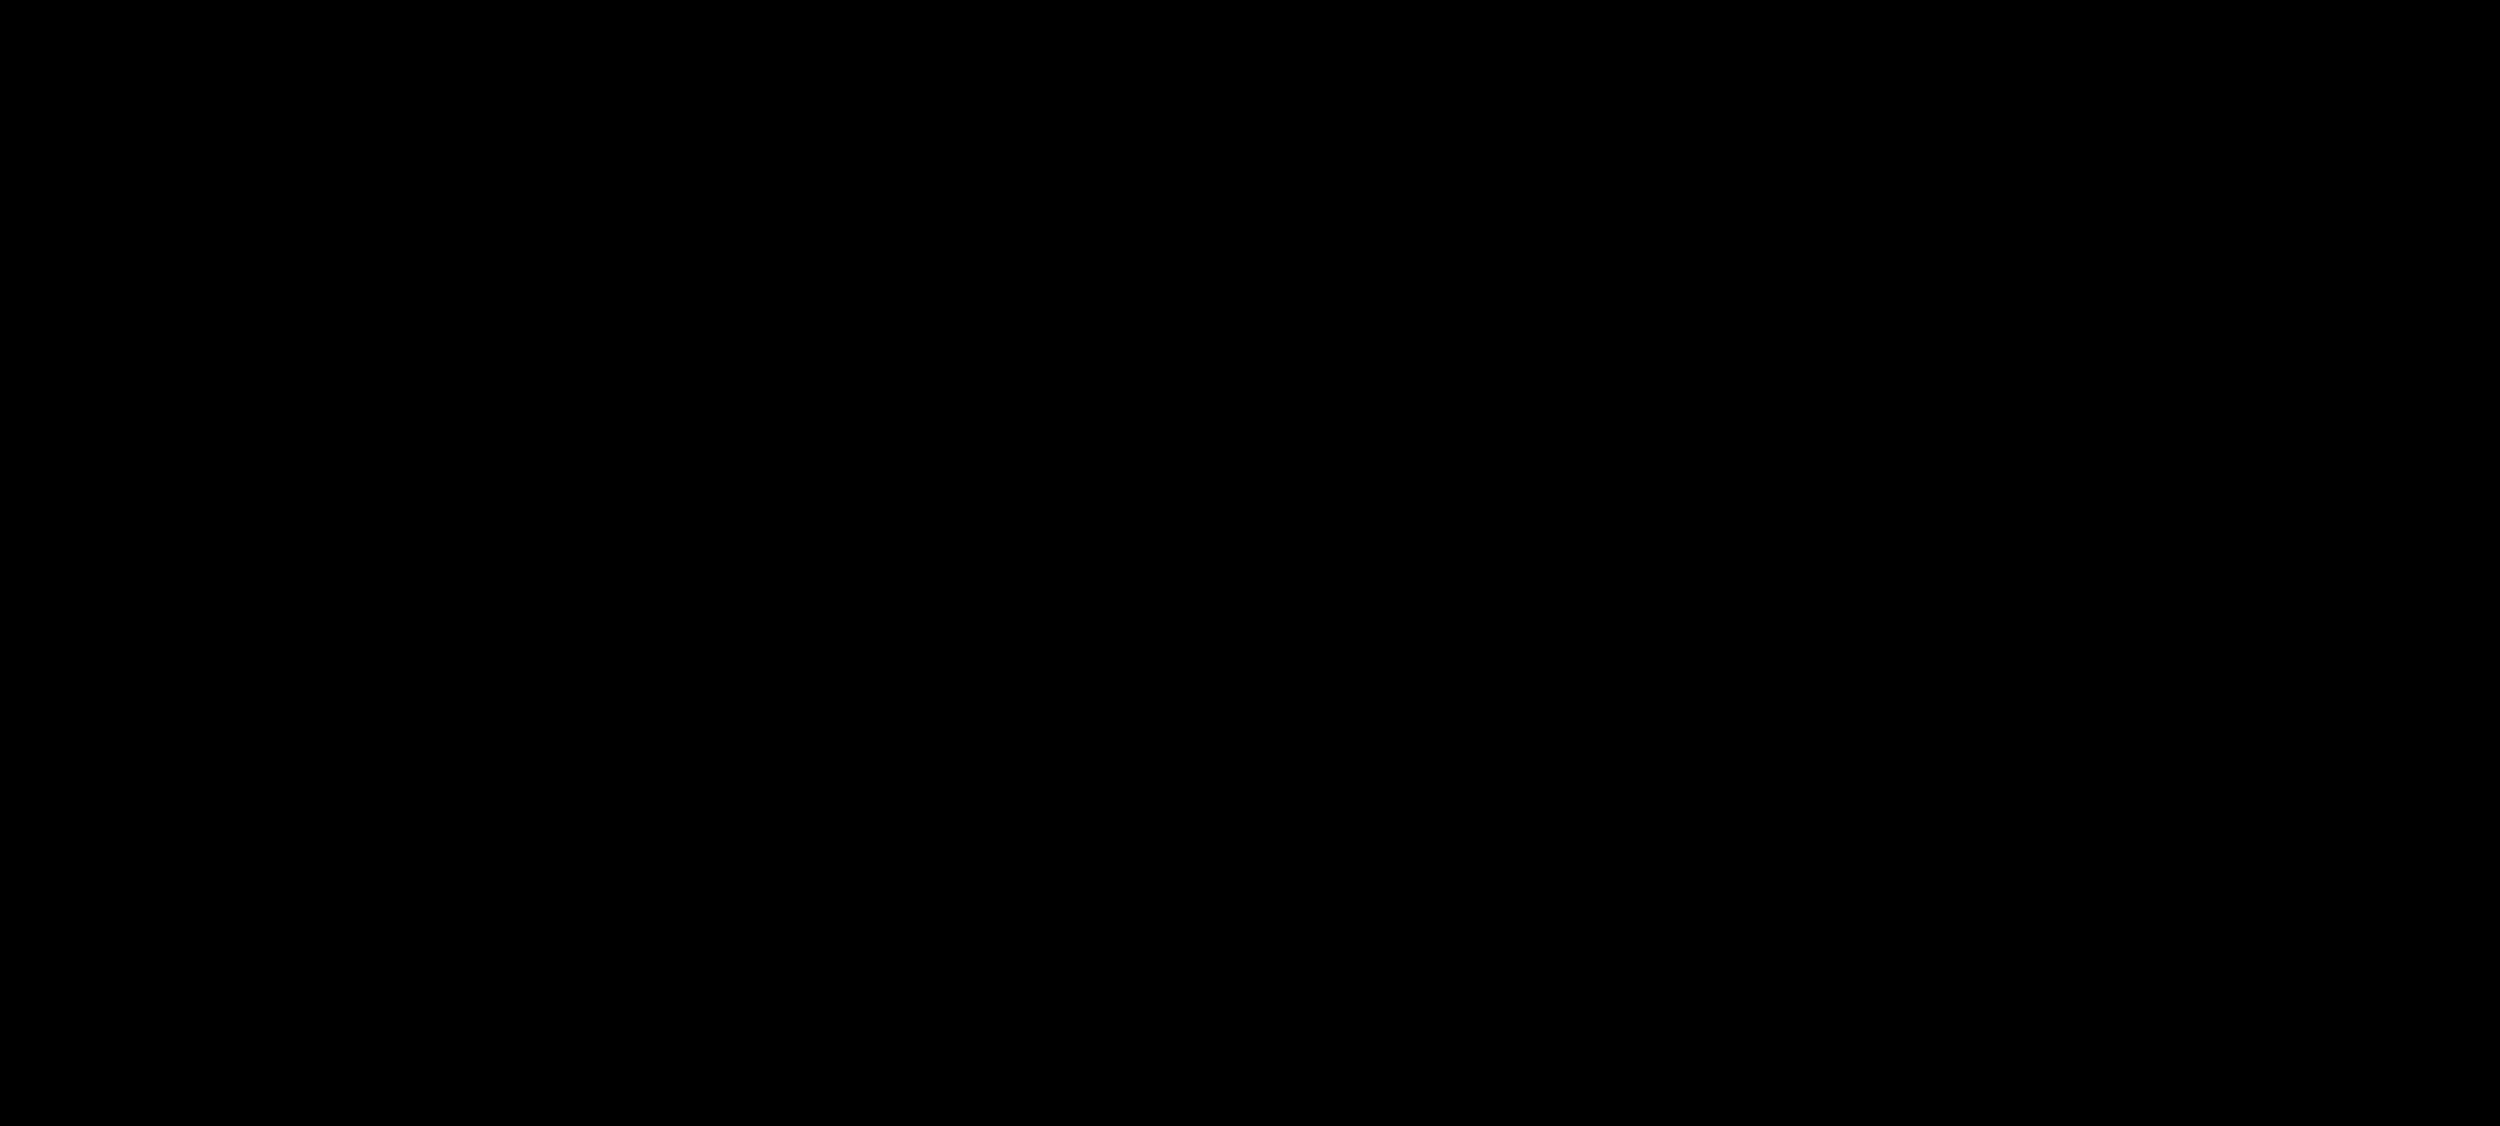 SQFF_Logo_black.png